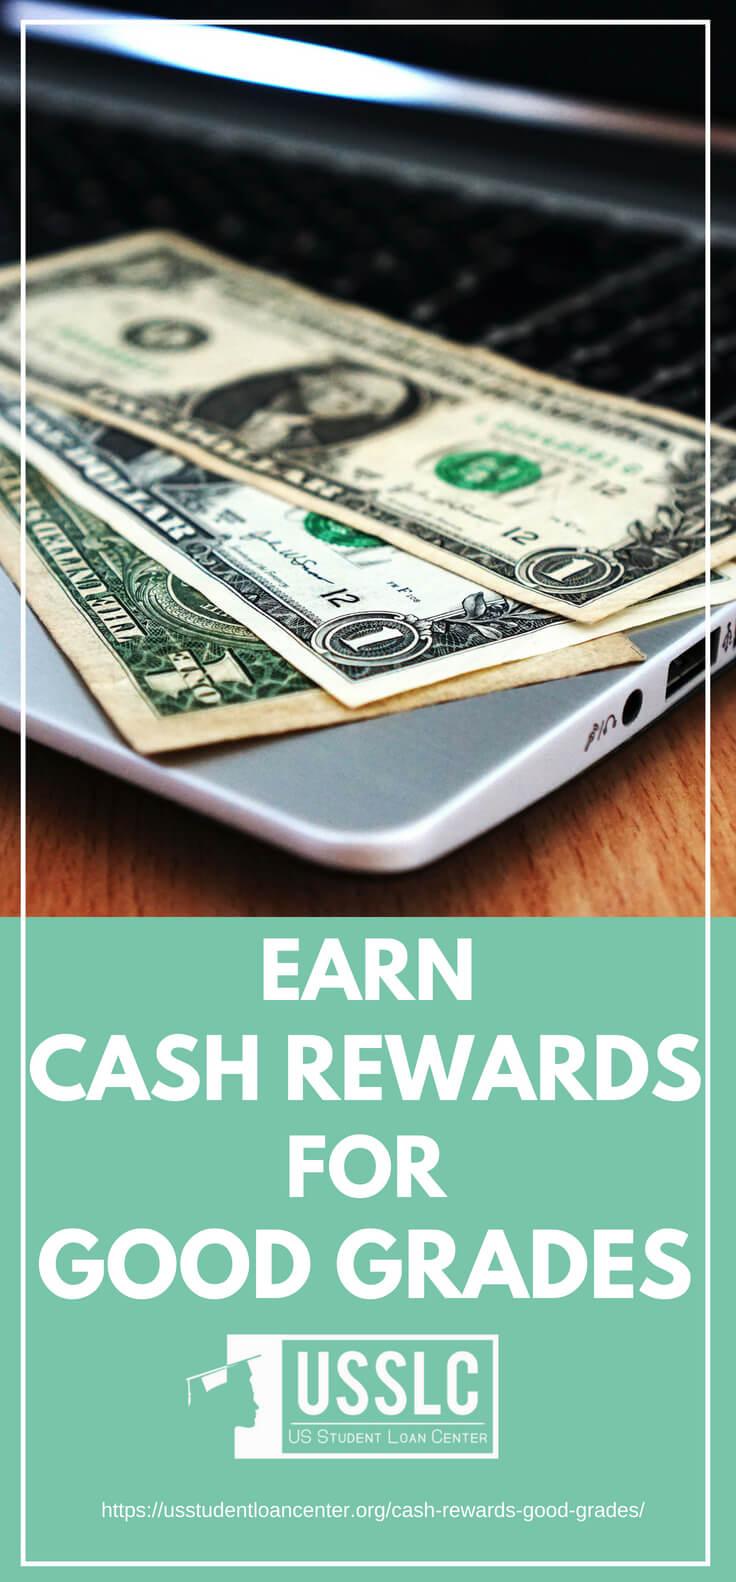 PLACARD | Earn Cash Rewards for Good Grades